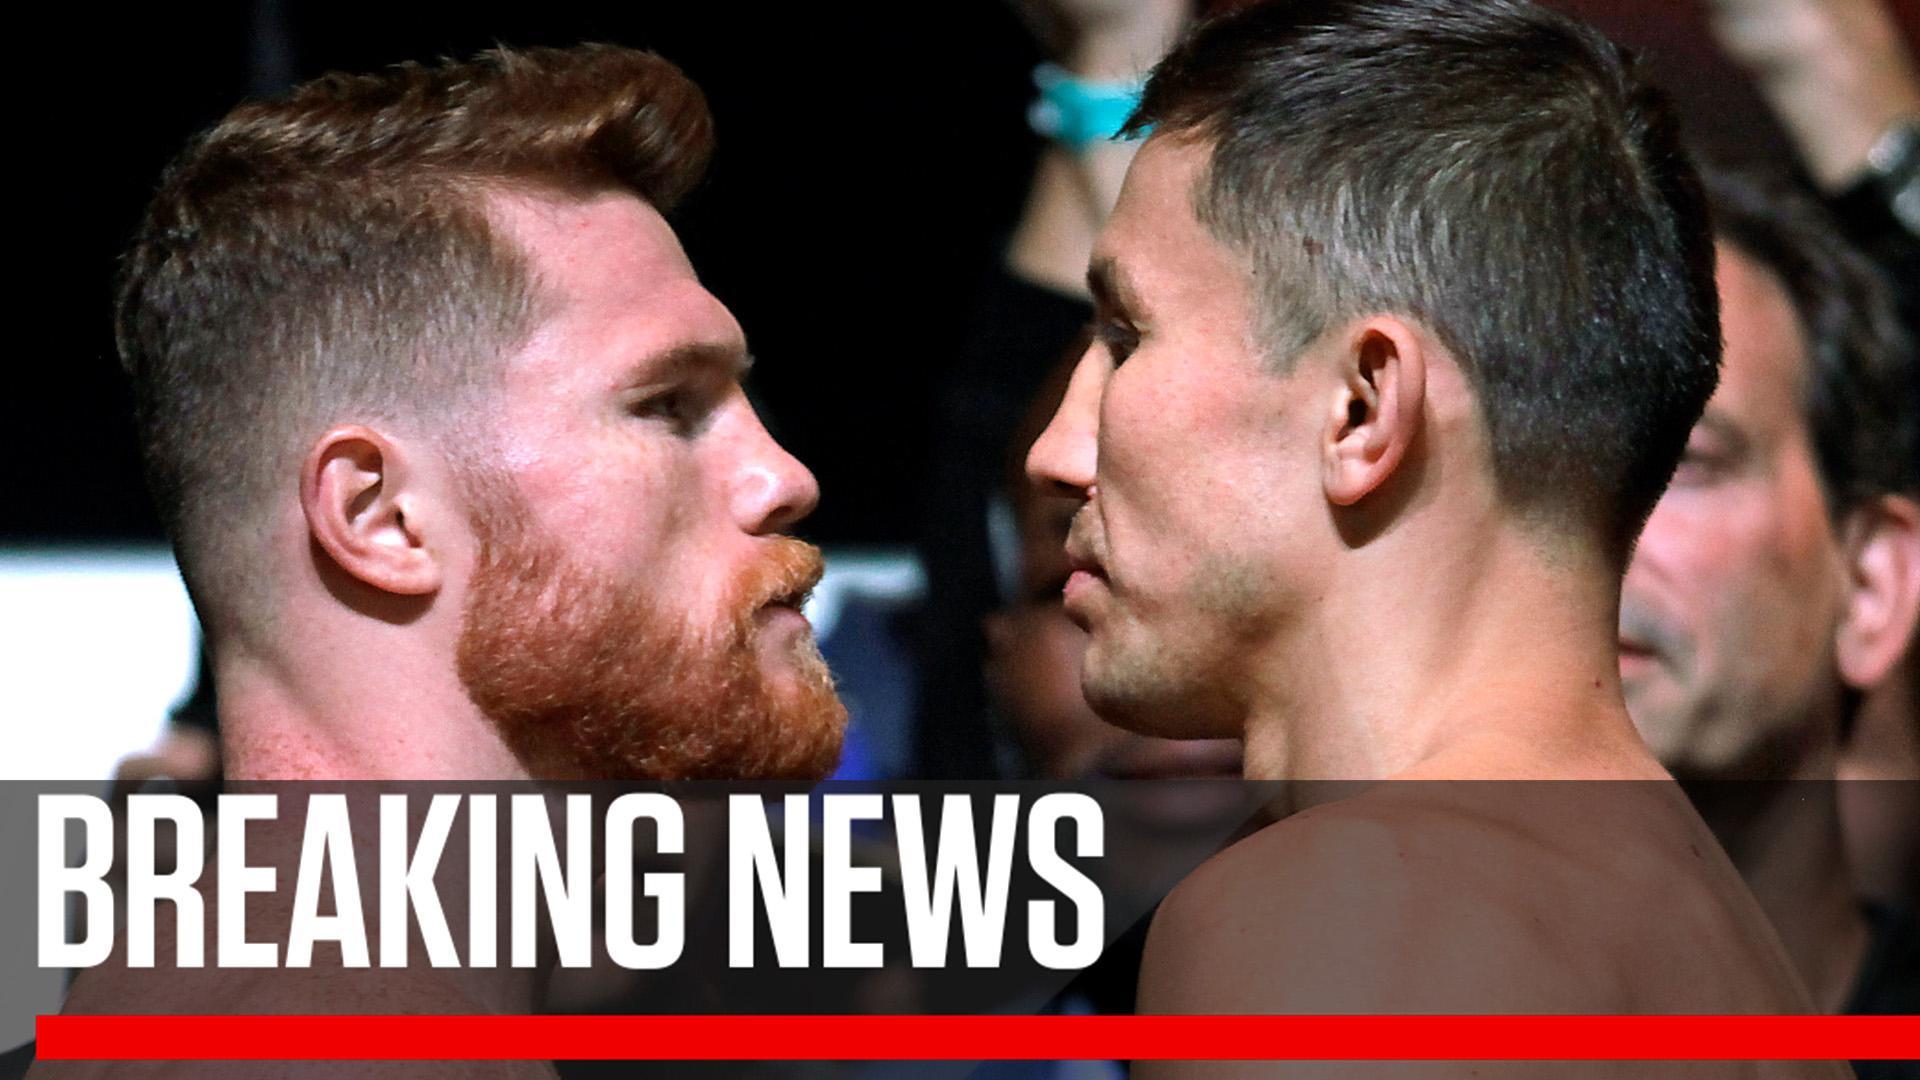 Breaking: Gennady Golovkin and Canelo Alvarez agree to fight September 15 in Las Vegas, says Oscar De La Hoya. https://t.co/77nCidOfLa